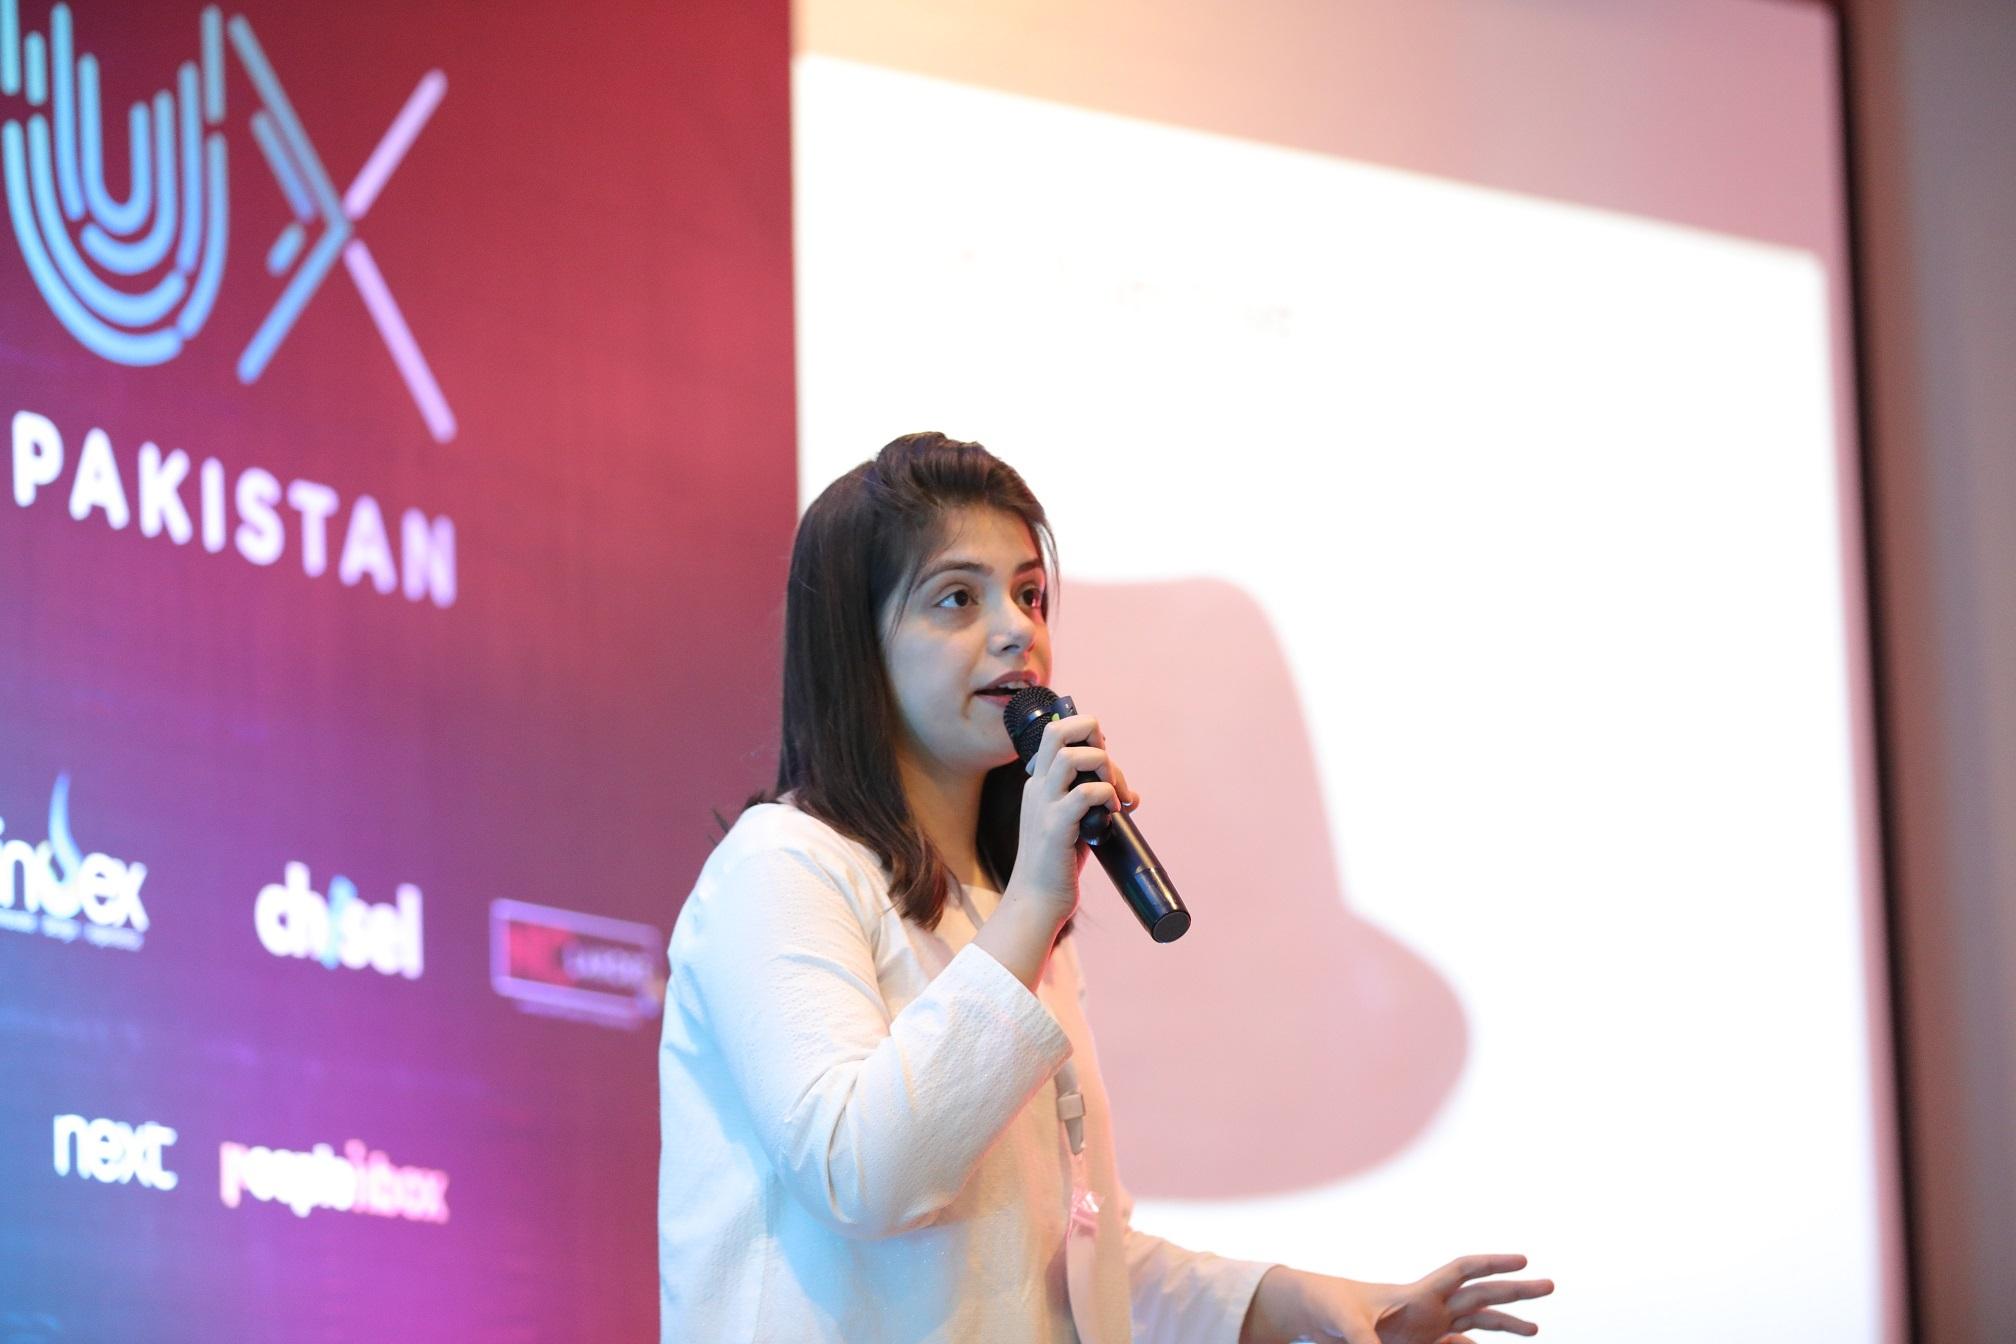 Asma Omer discussing the success of Marham.pk at UX Pakistan